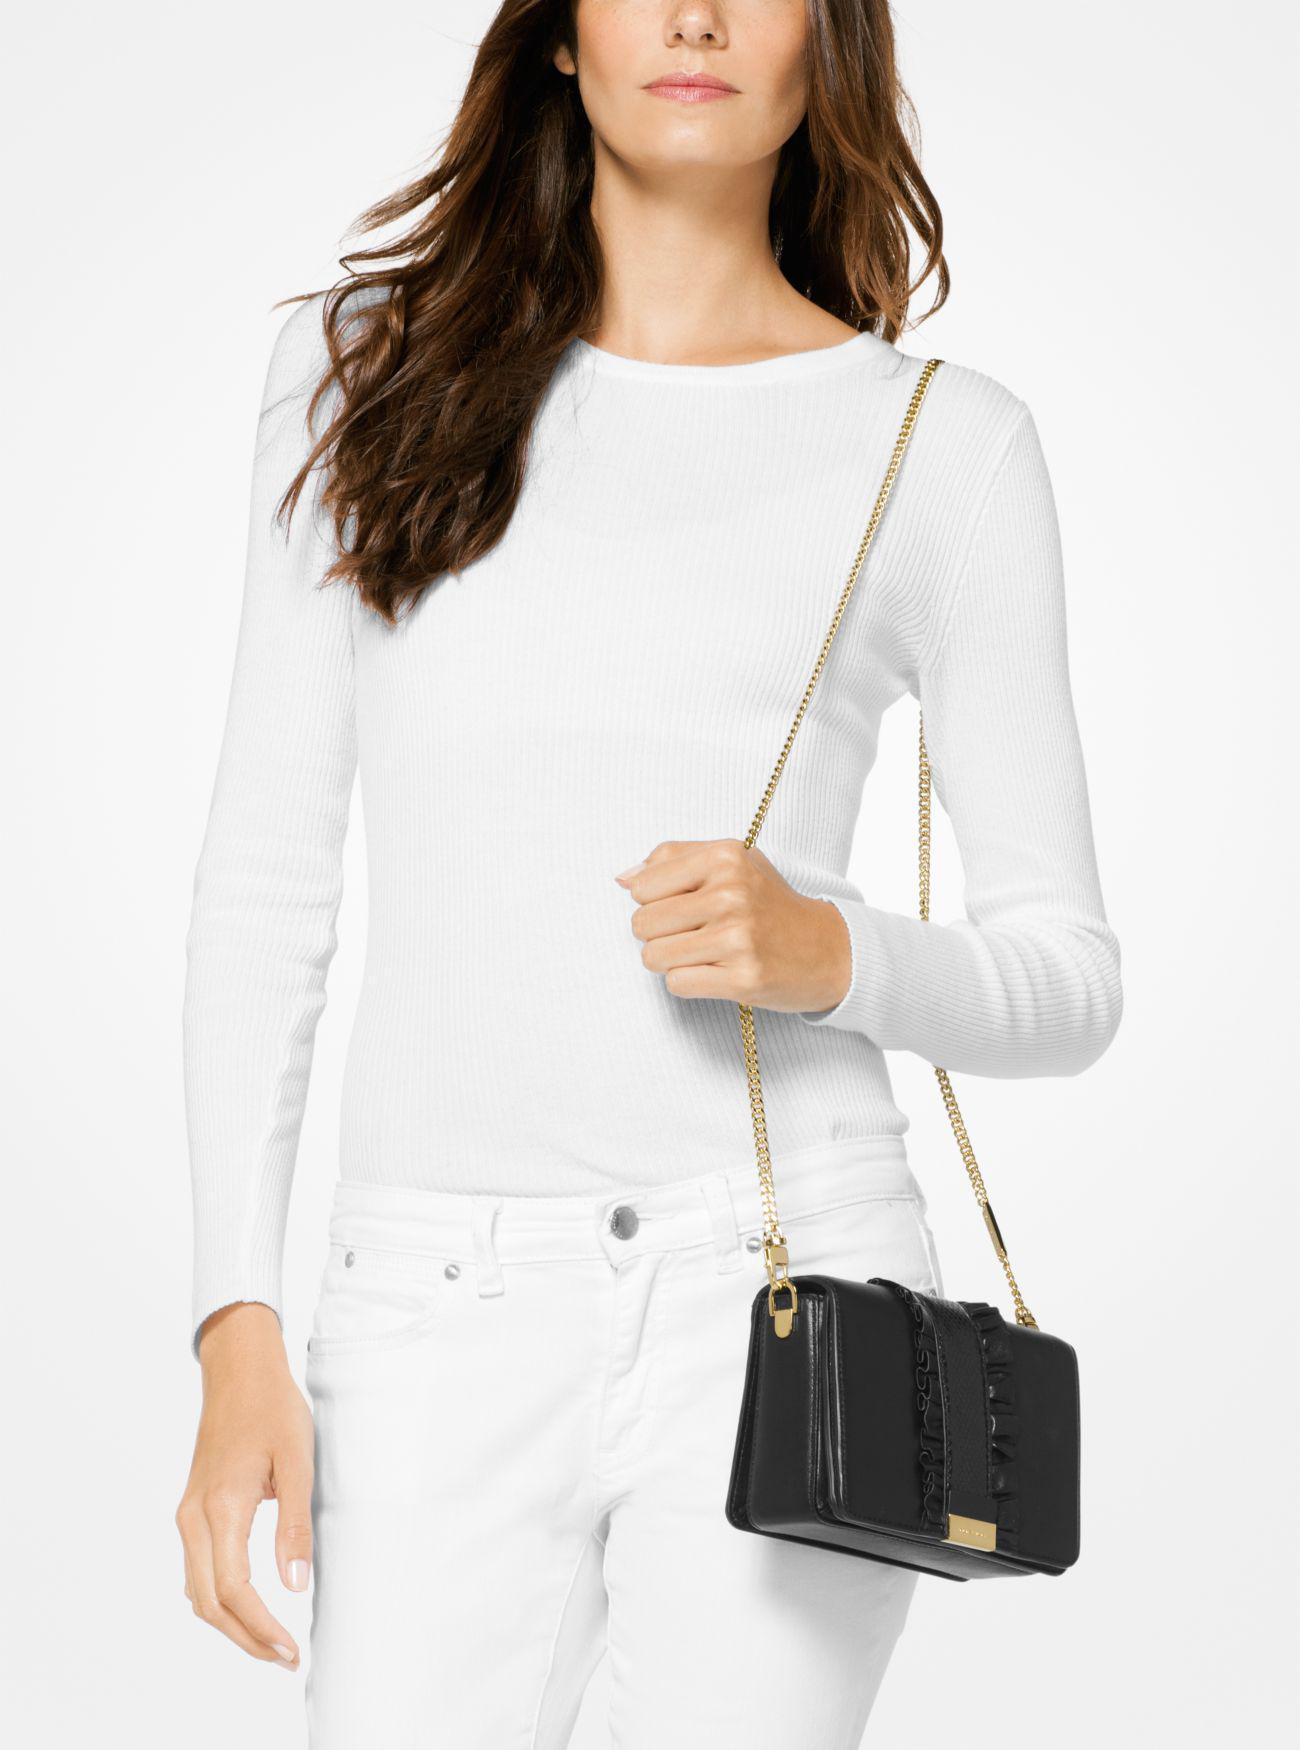 Lyst Michael Kors Jade Ruffled Leather Clutch In Black